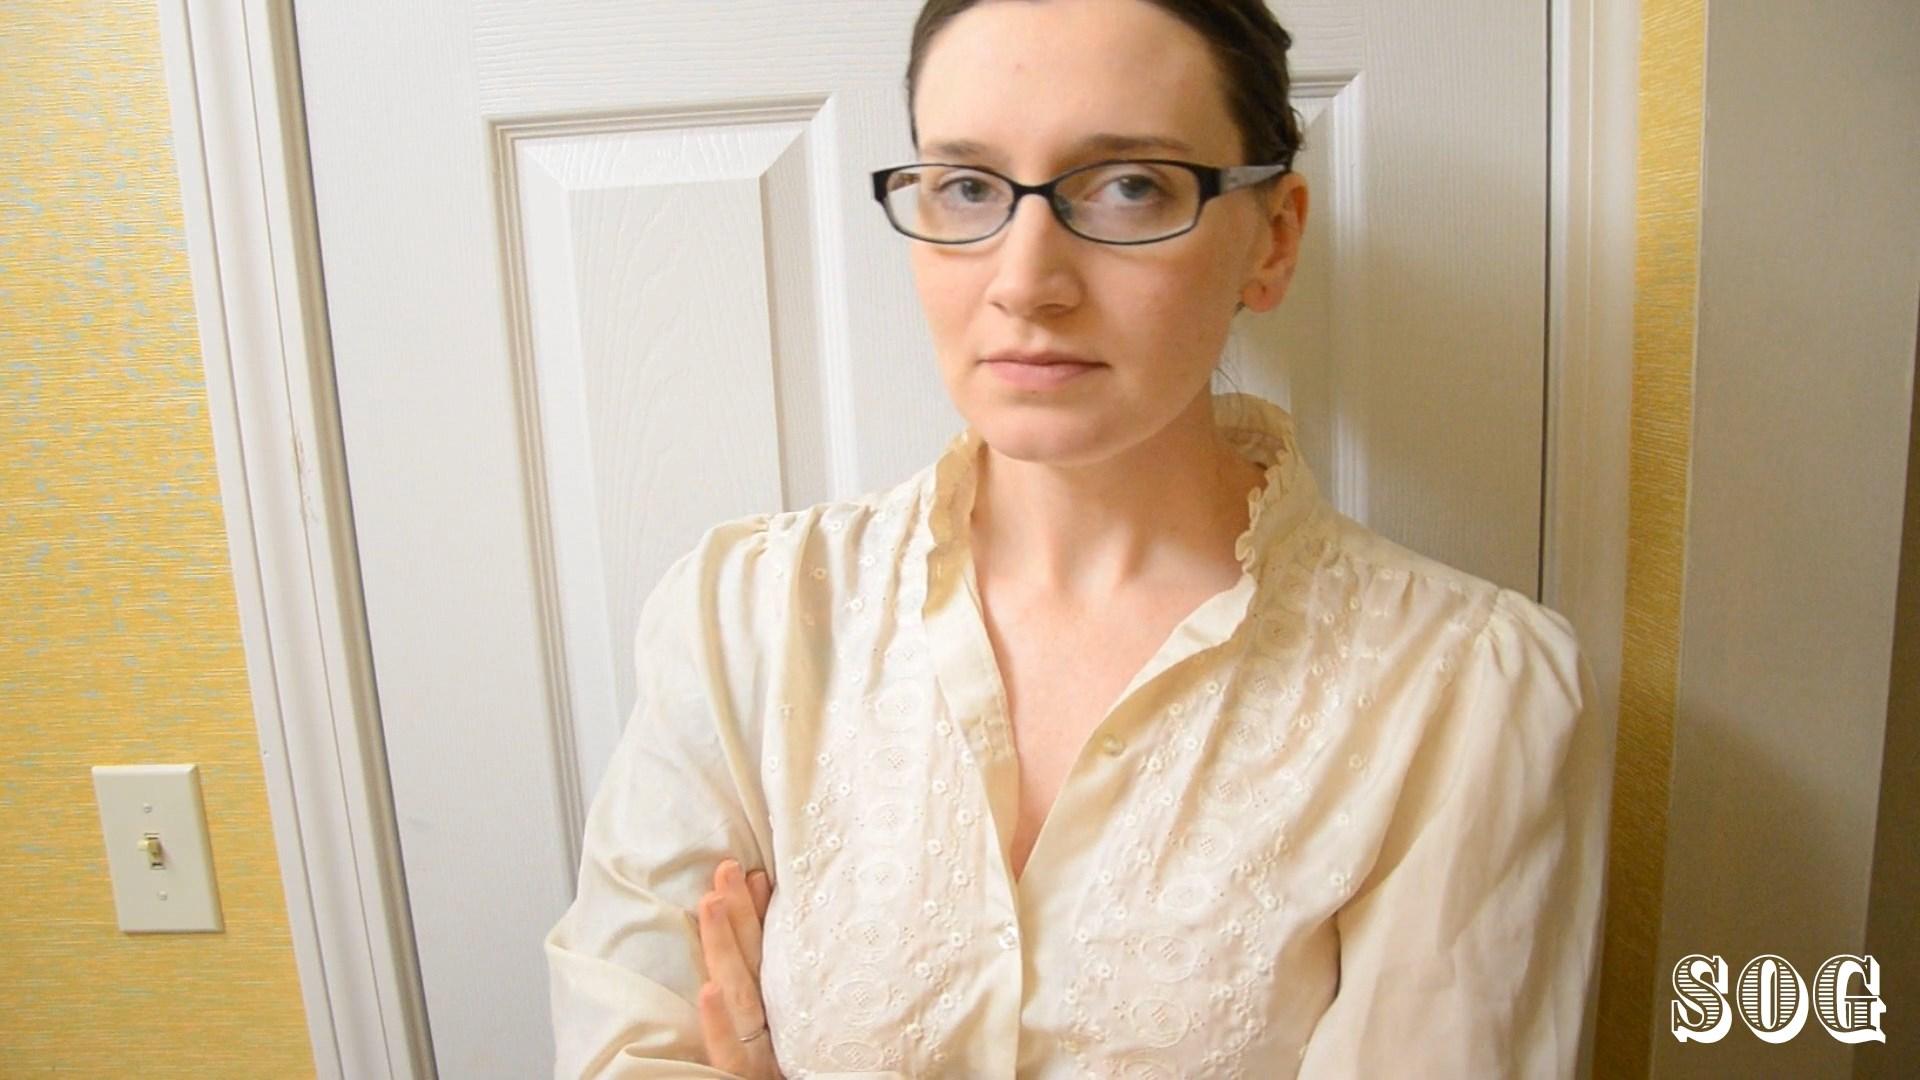 Fucking Teacher in the Closet (Stuck in the Closet with Teacher) - Bettie Bondage